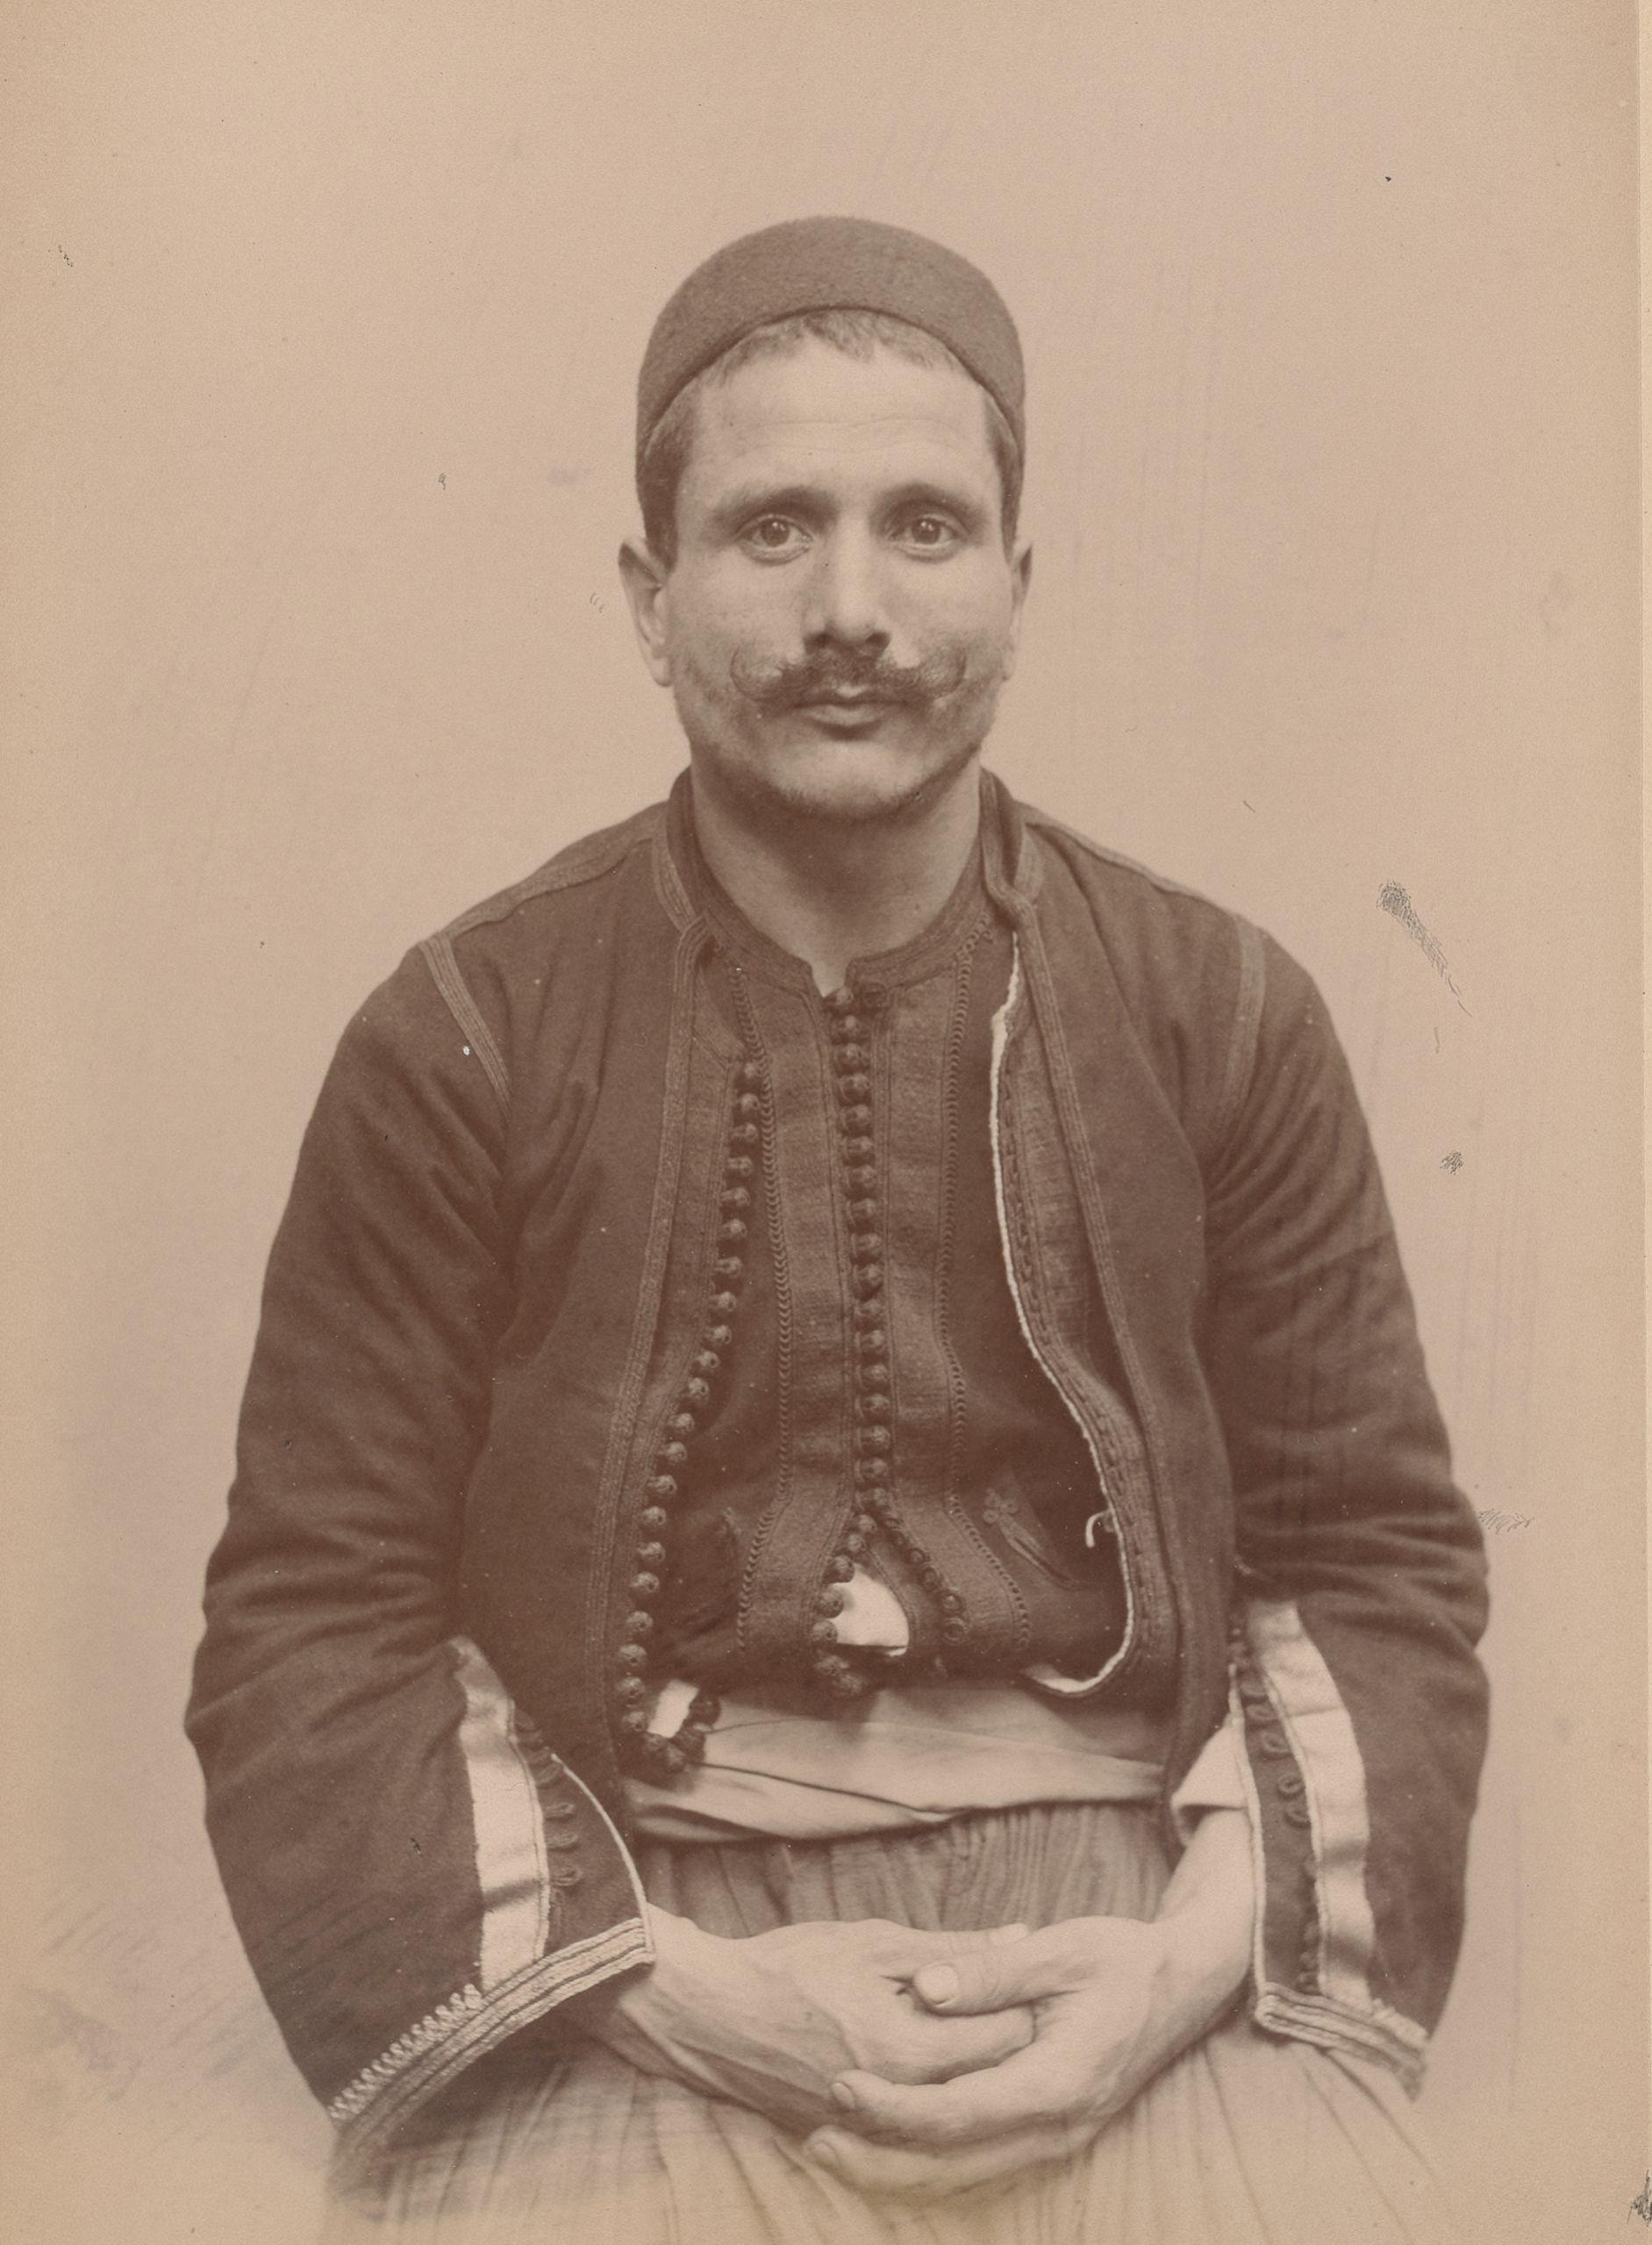 Мохамед 30, Алжир, Айфсаона, сапожник (вид спереди)